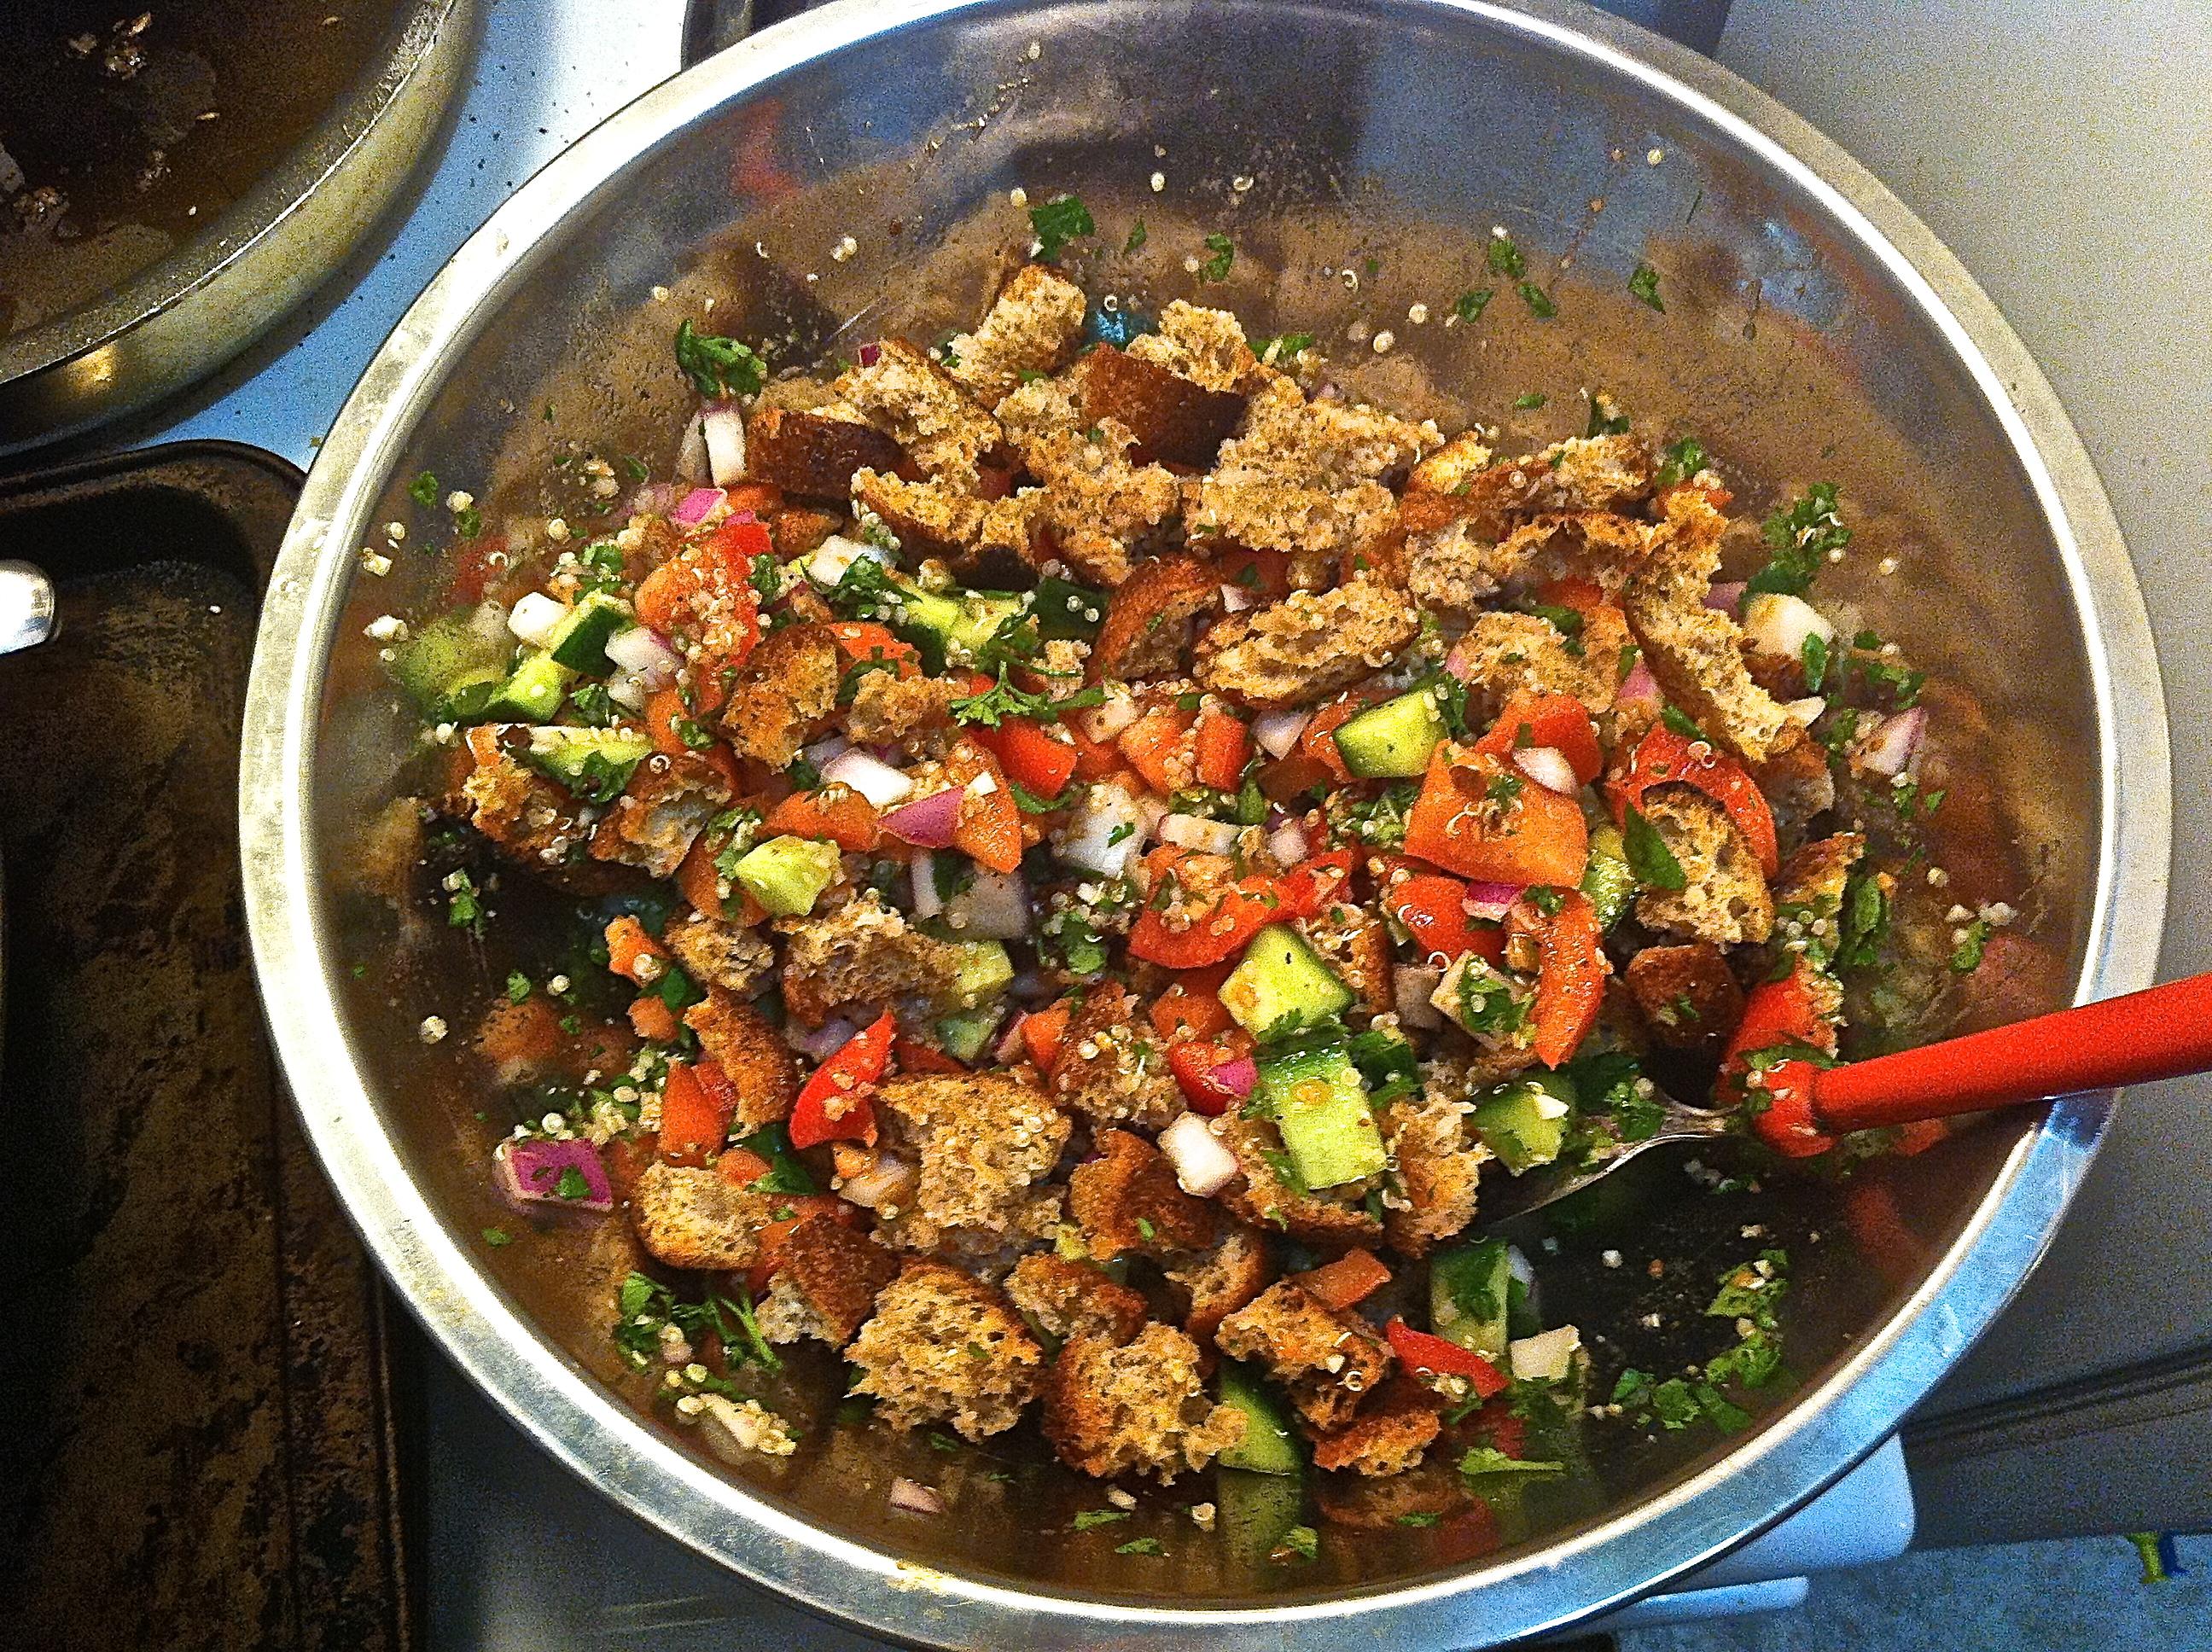 Ottolenghi The Cookbook Cover Recipe ~ Plenty by yotam ottolenghi flashbracket